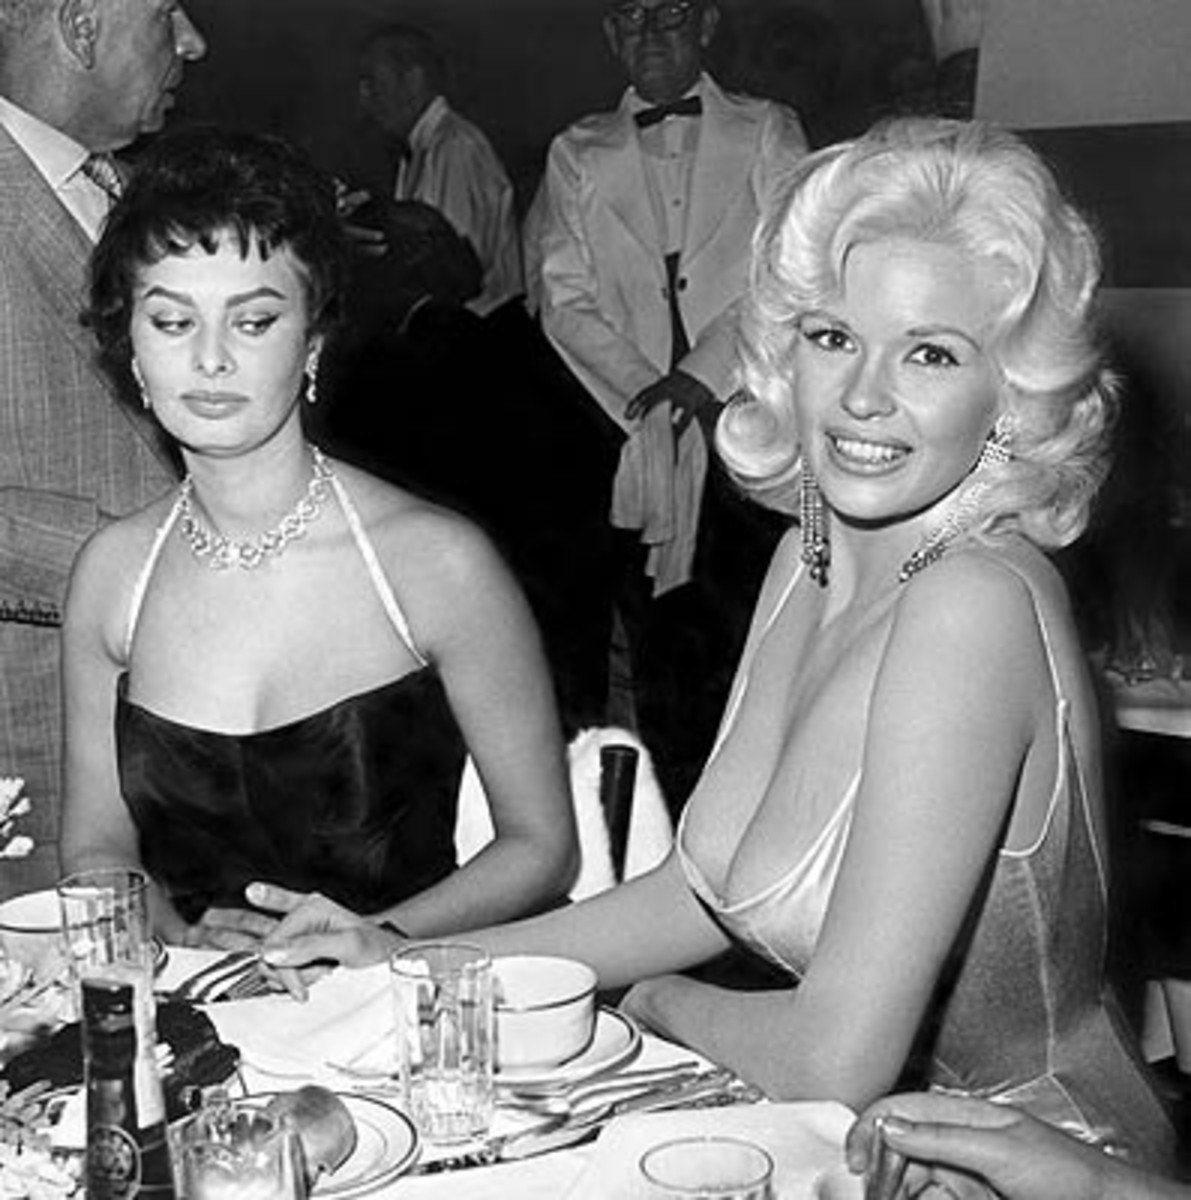 Sofia Loren & Jayne Mansfield